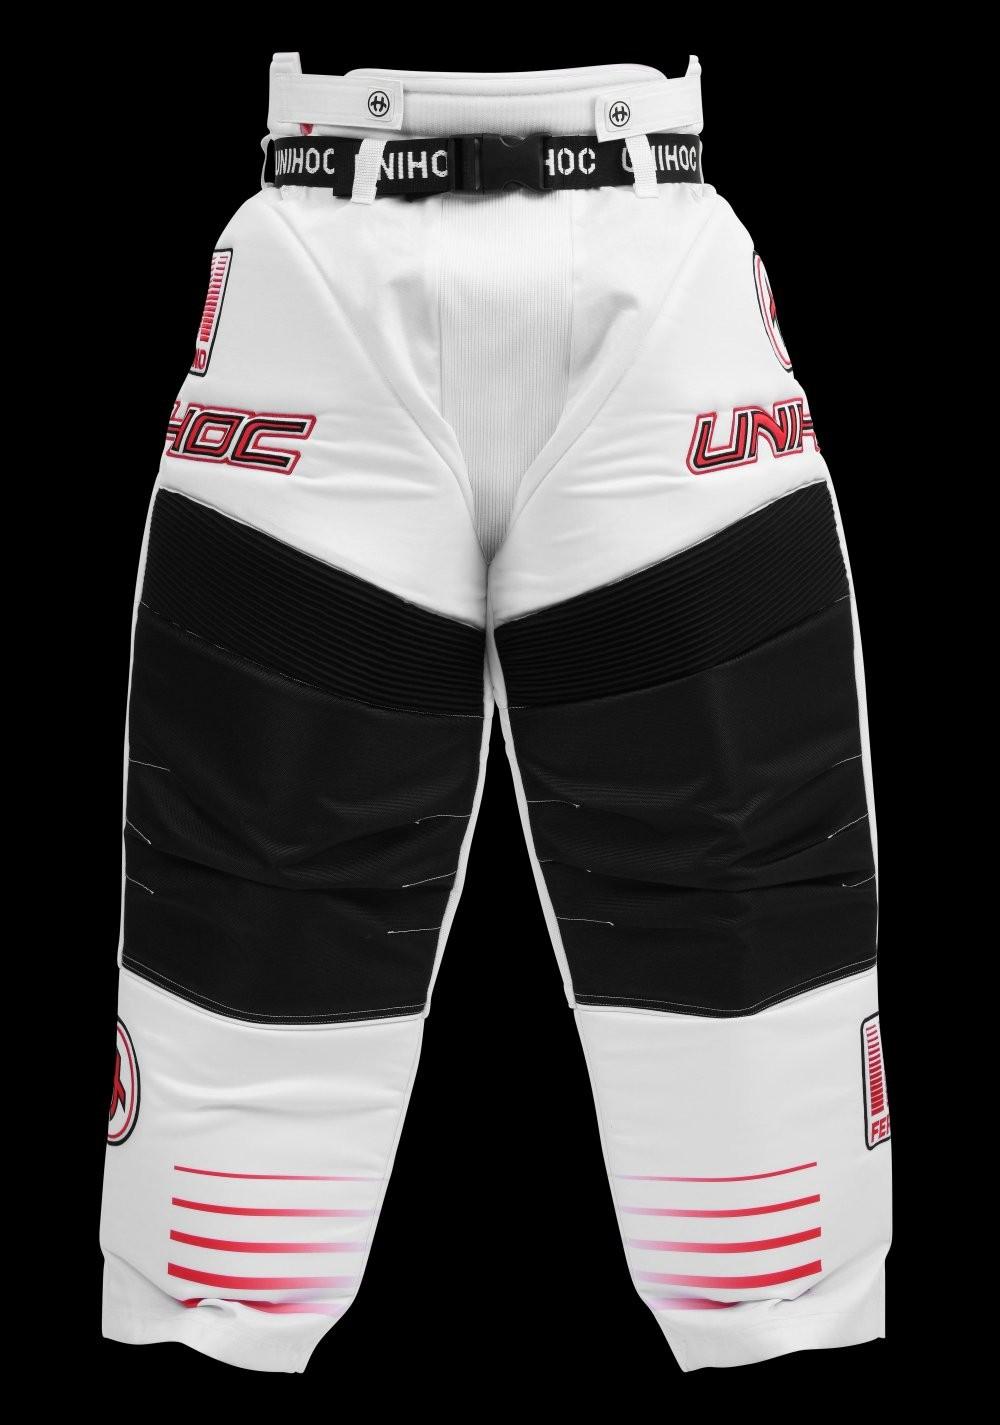 unihoc Goalieset Inferno Junior weiss/neon rot